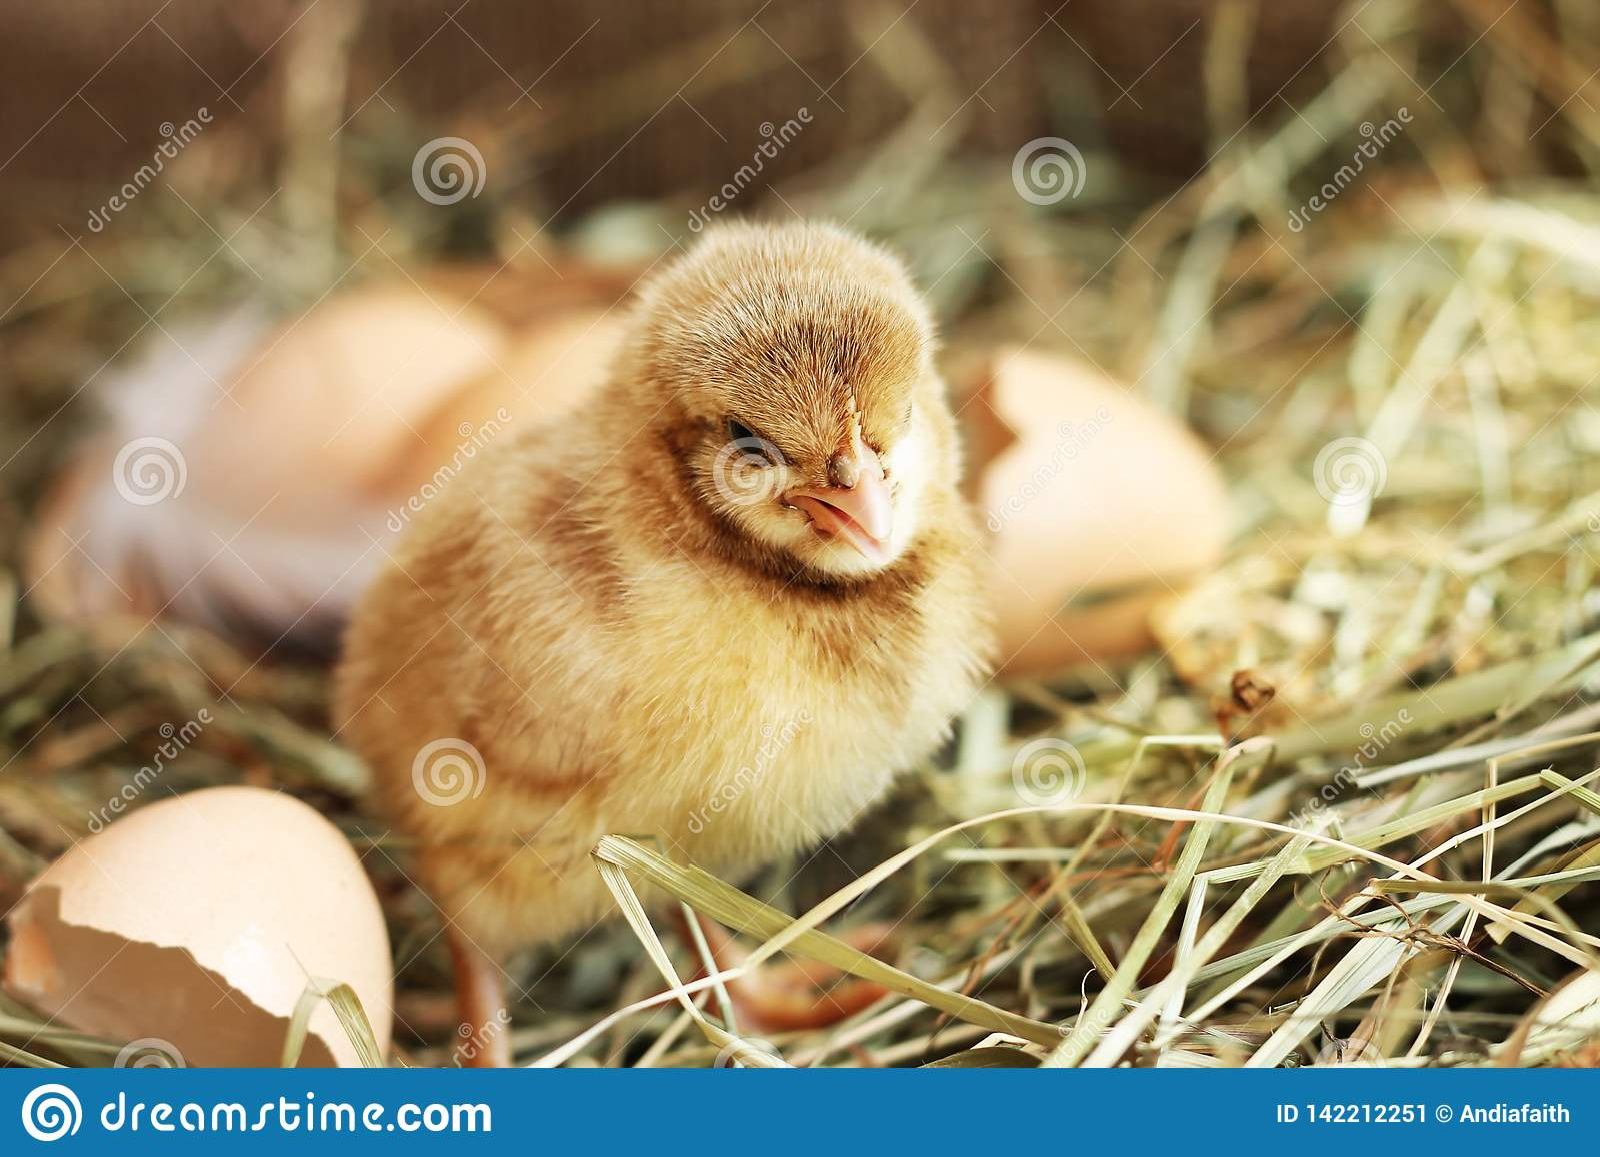 Farming Beeld van weinig kip op hooi